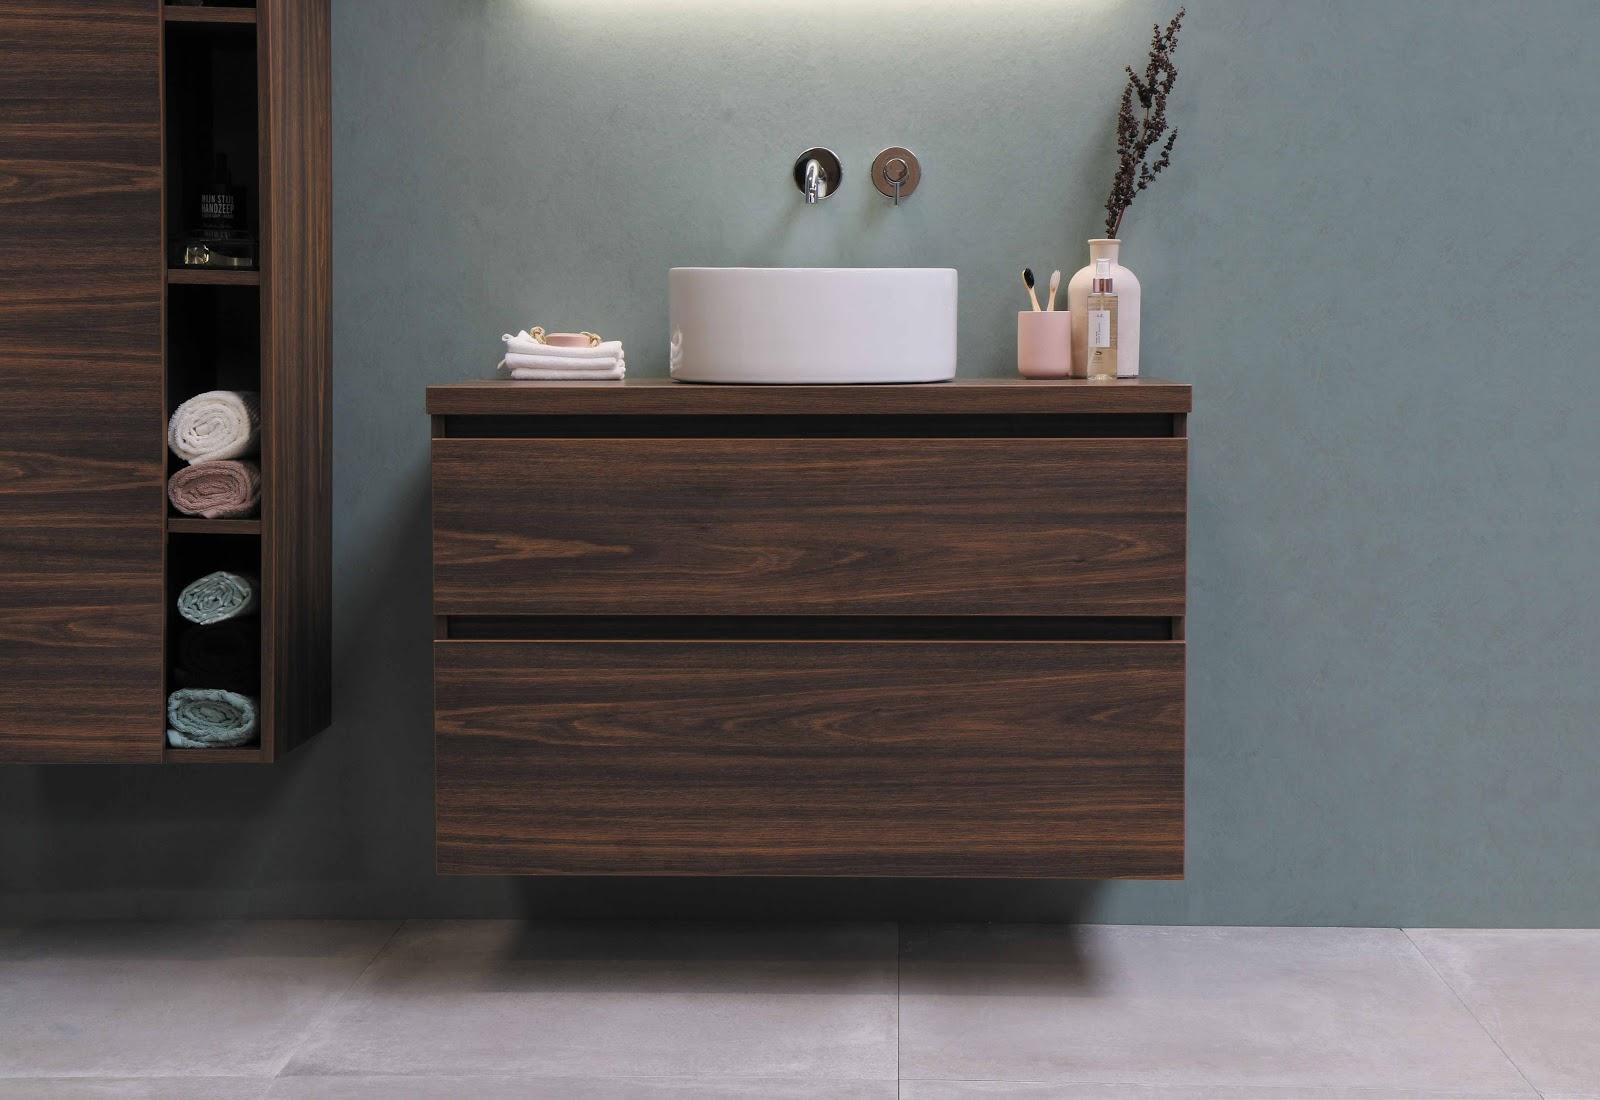 Basement Storage Ideas - Cabinets